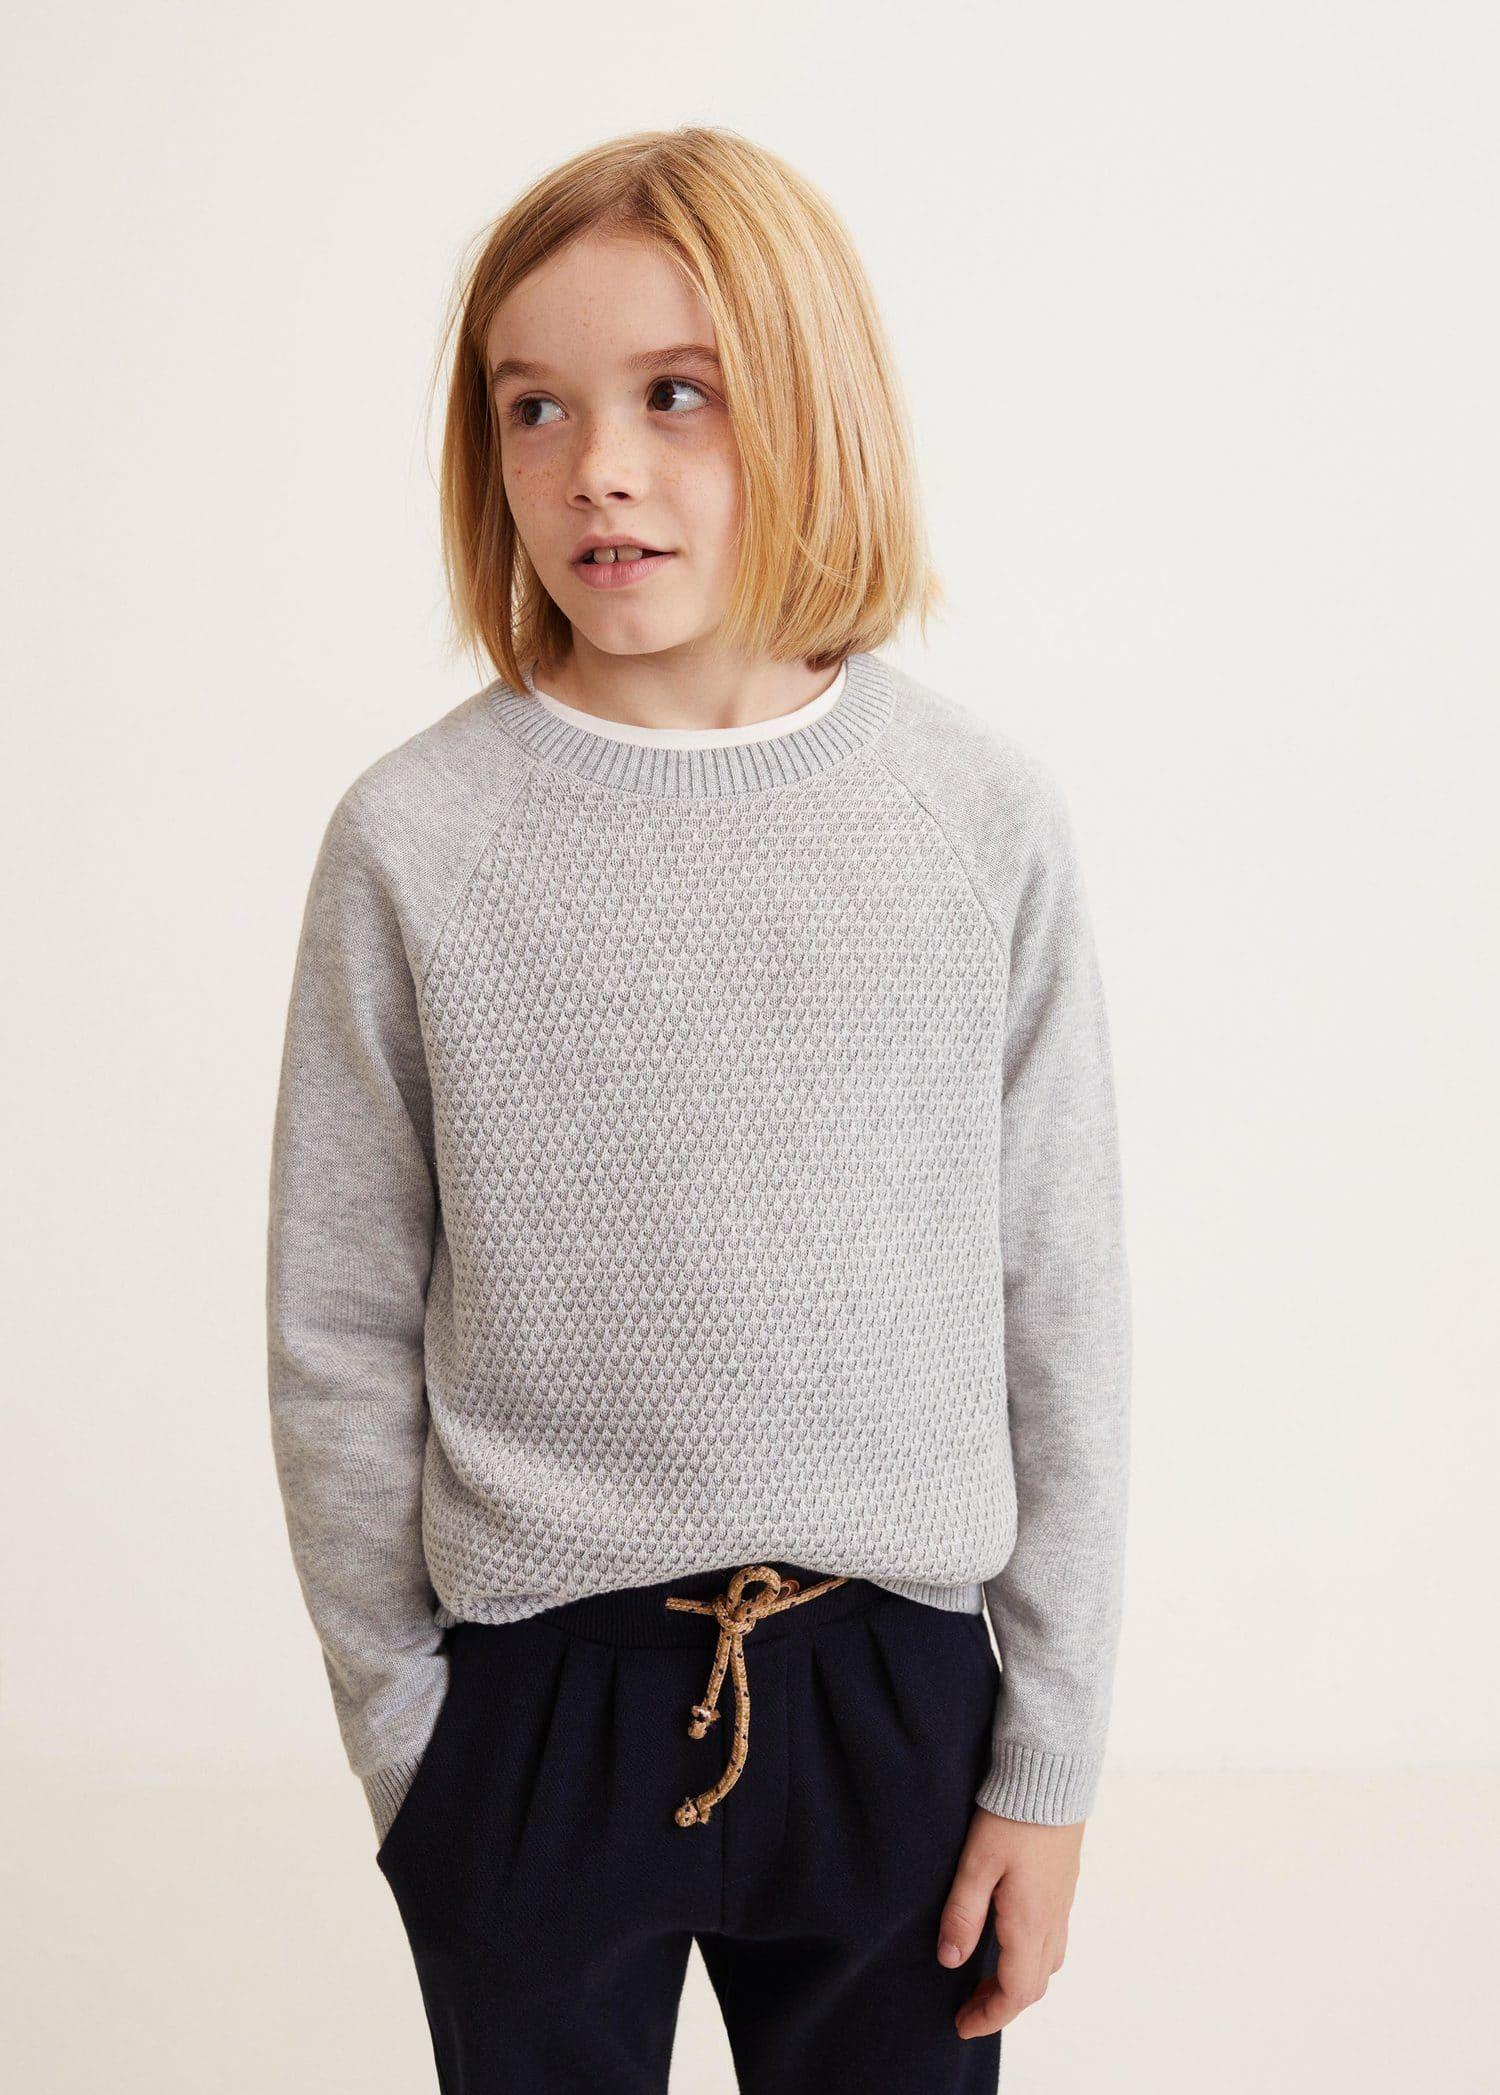 cheaper latest design sale uk Contrasting knit sweater - Boys   Mango Kids Lithuania